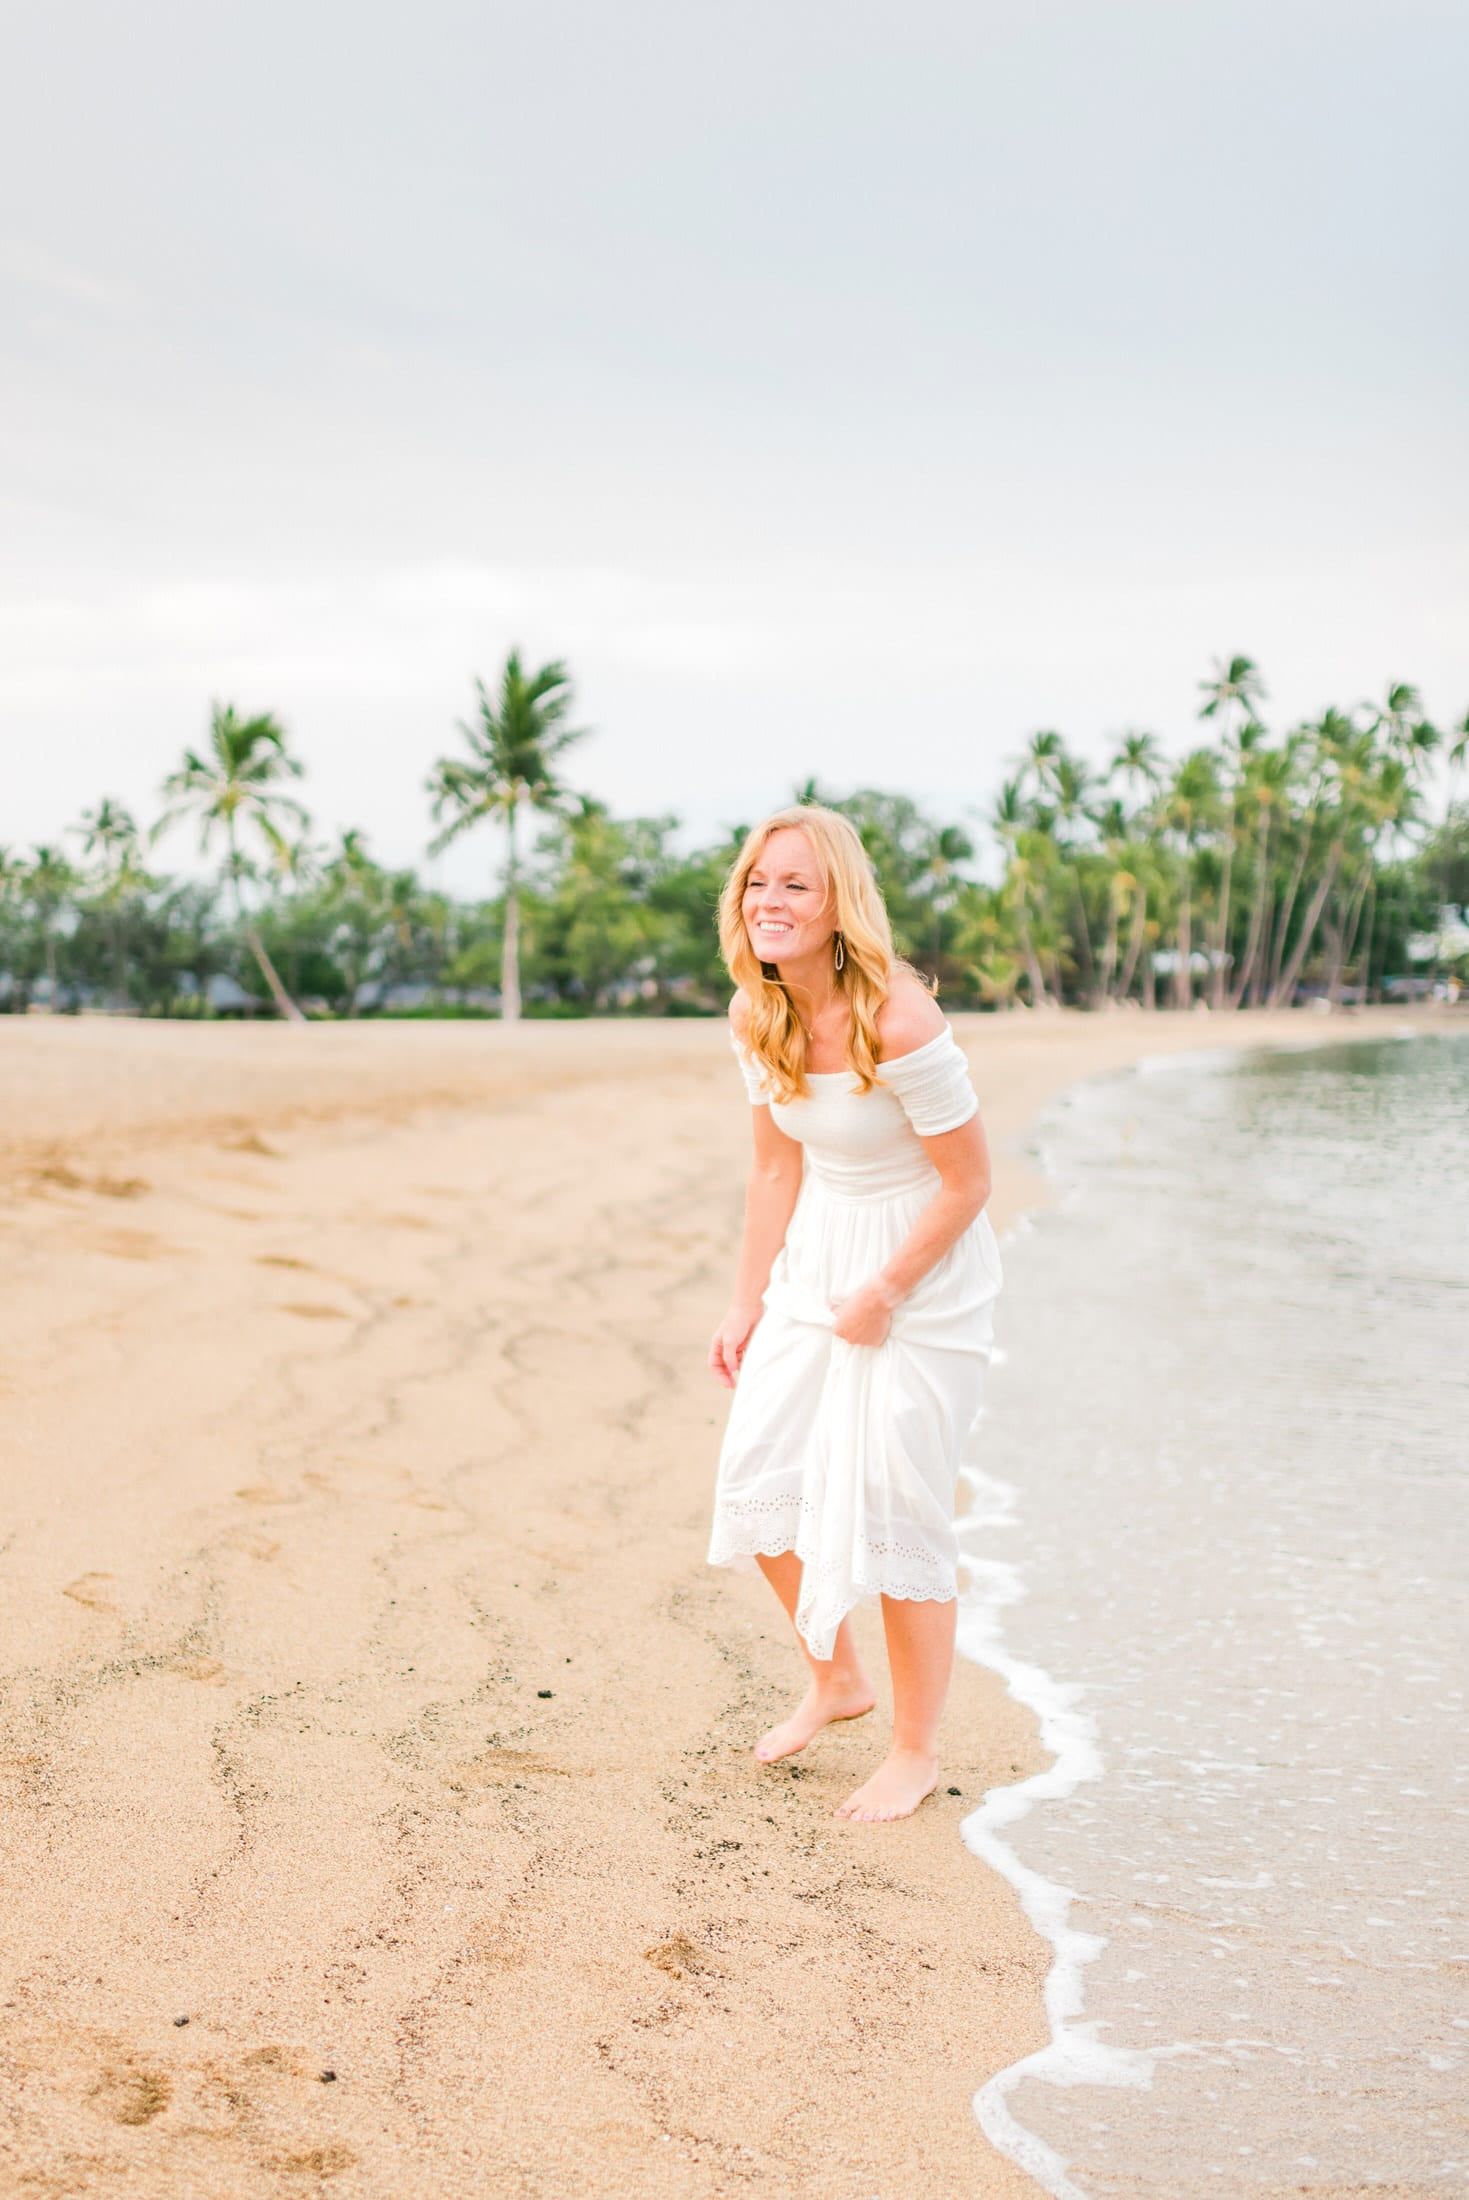 Waikoloa-Beach-Family-Photographer-Hawaii-63-1.jpg